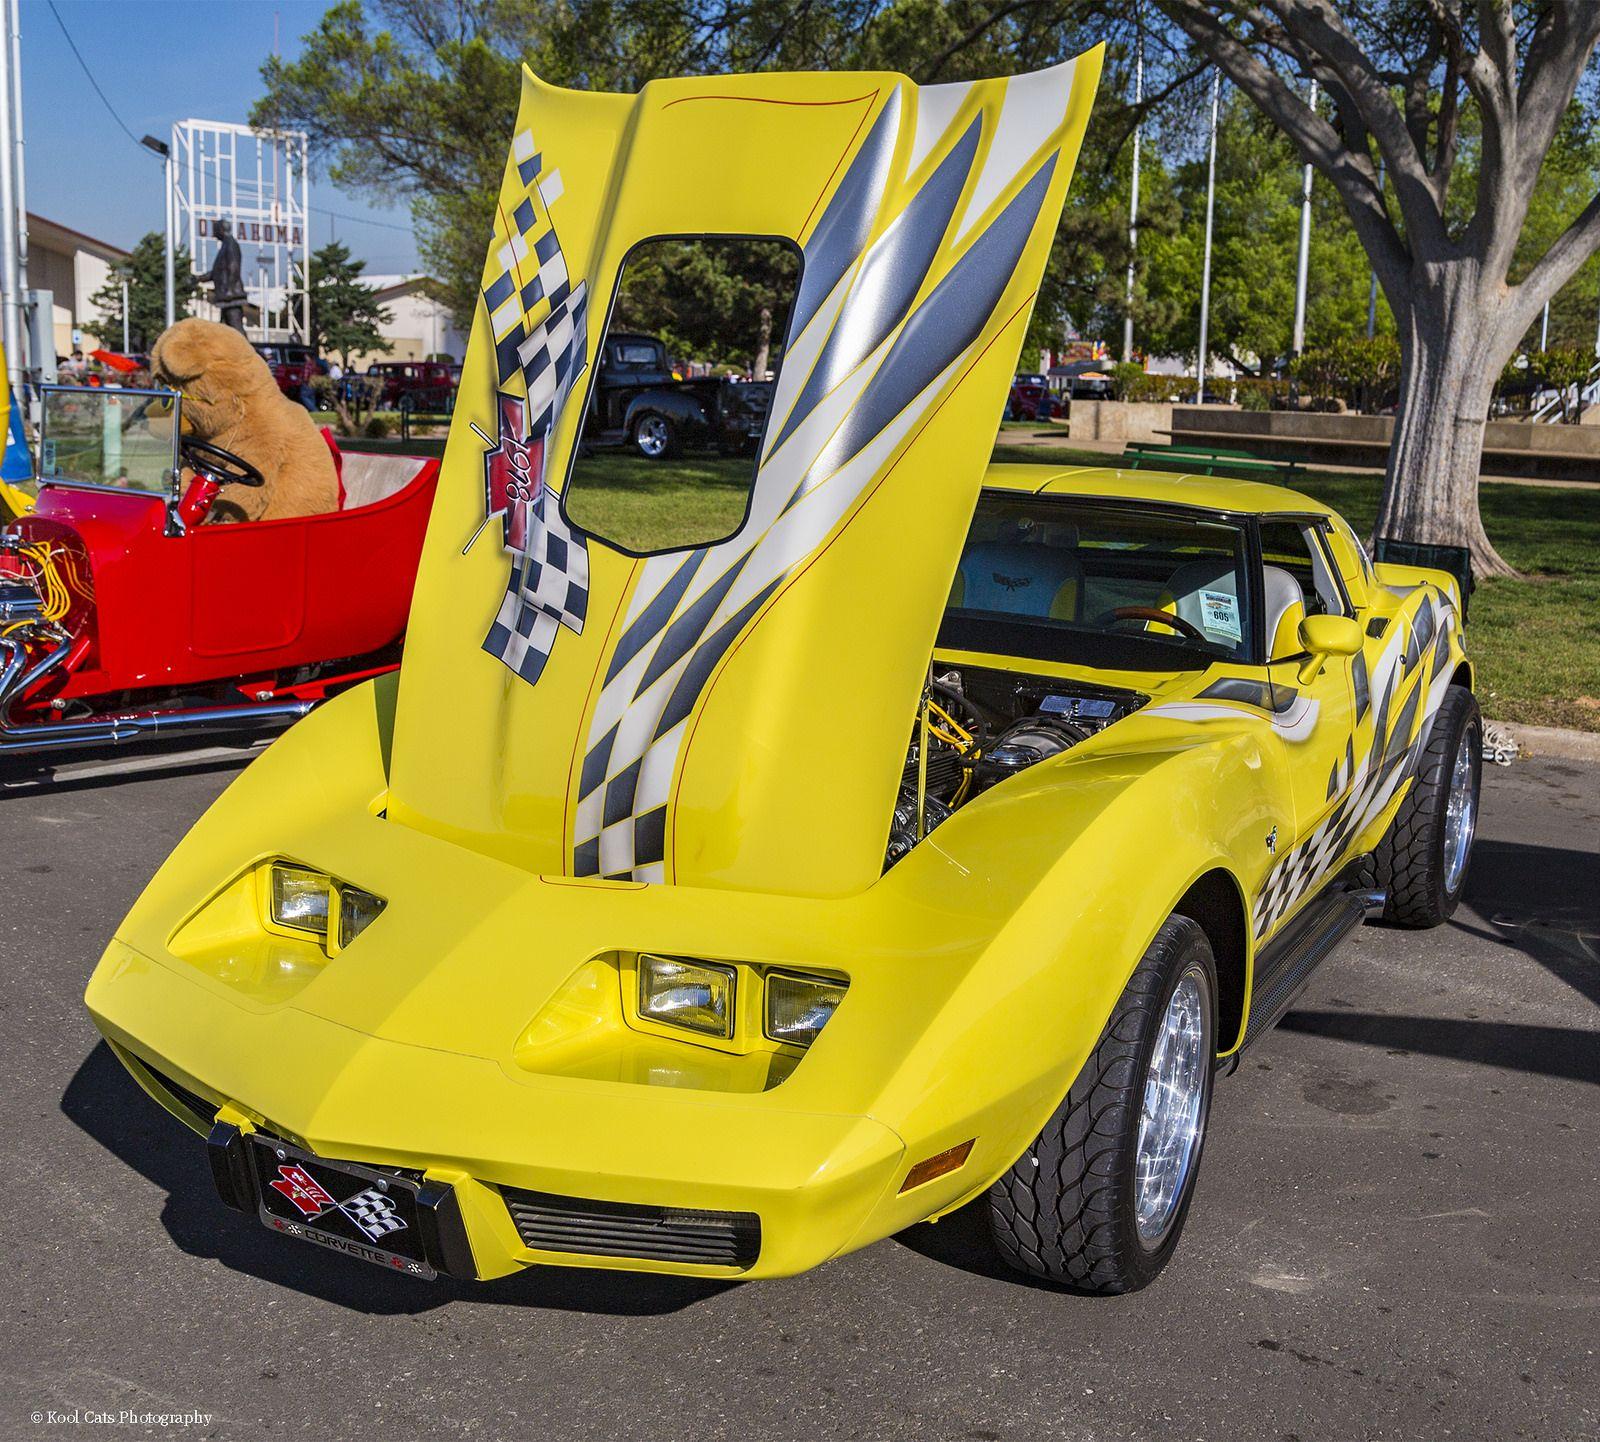 1978 Yellow Corvette Yellow Corvette Corvette Car Show